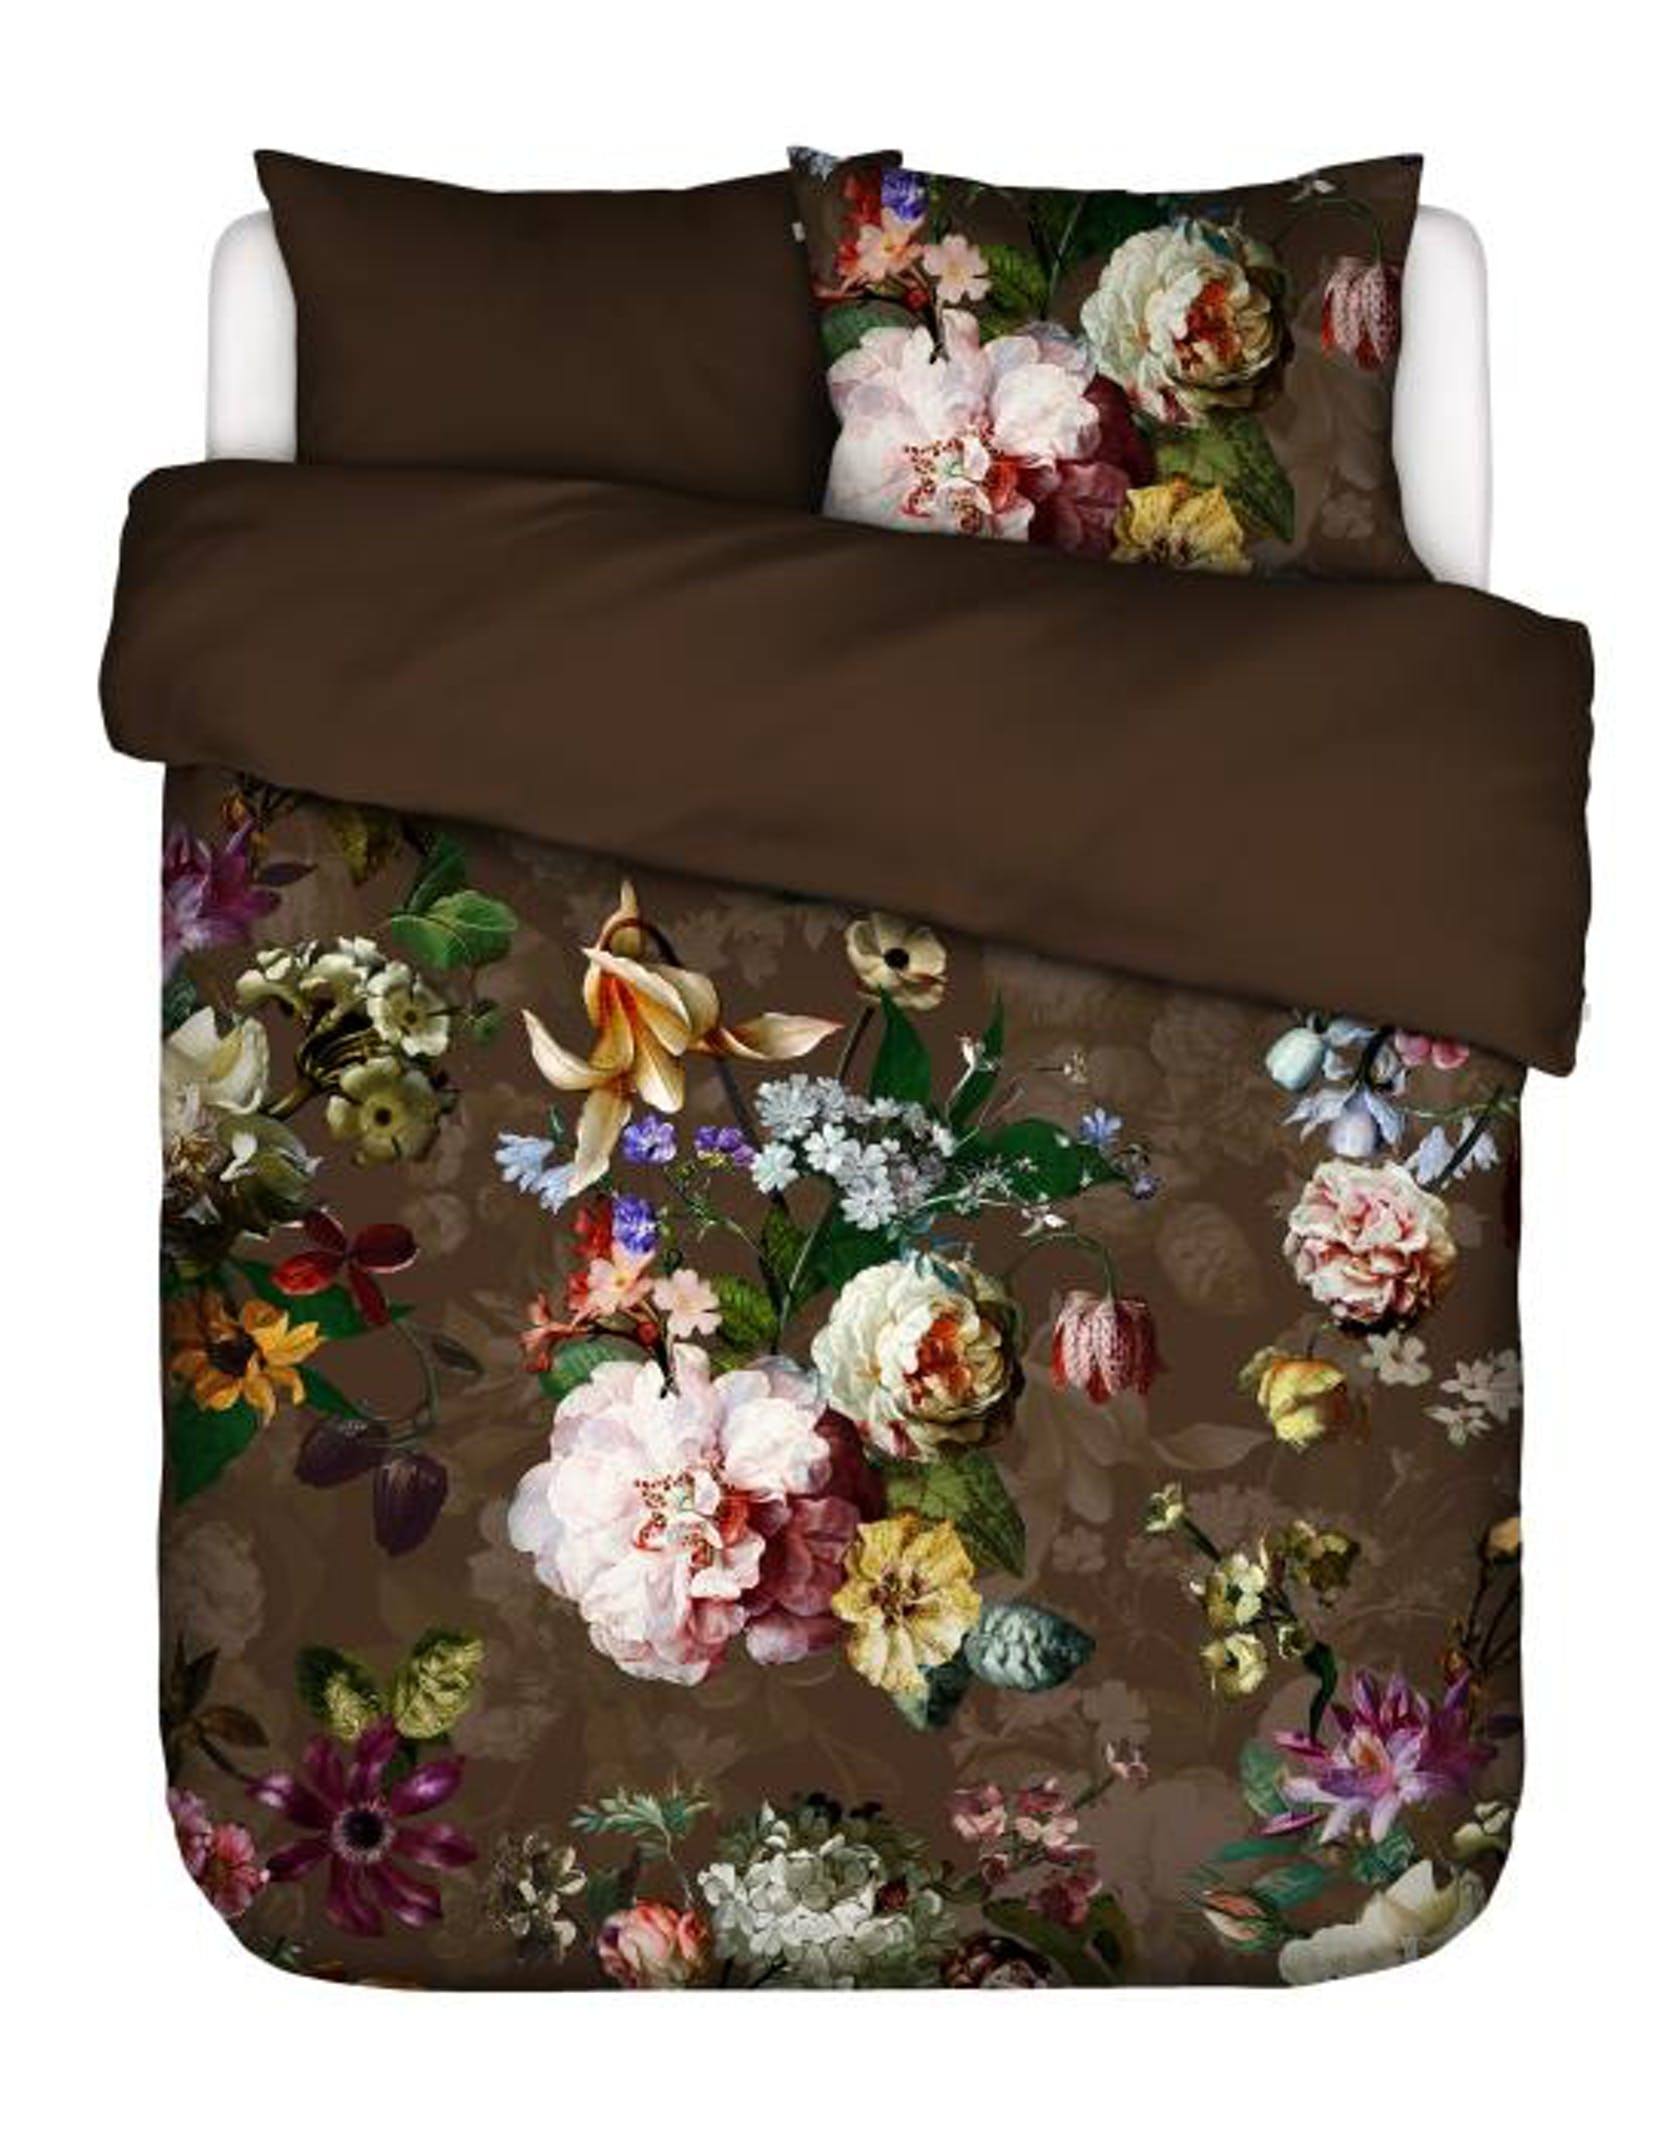 ESSENZA Fleur Chocolate Duvet cover 240 x 220